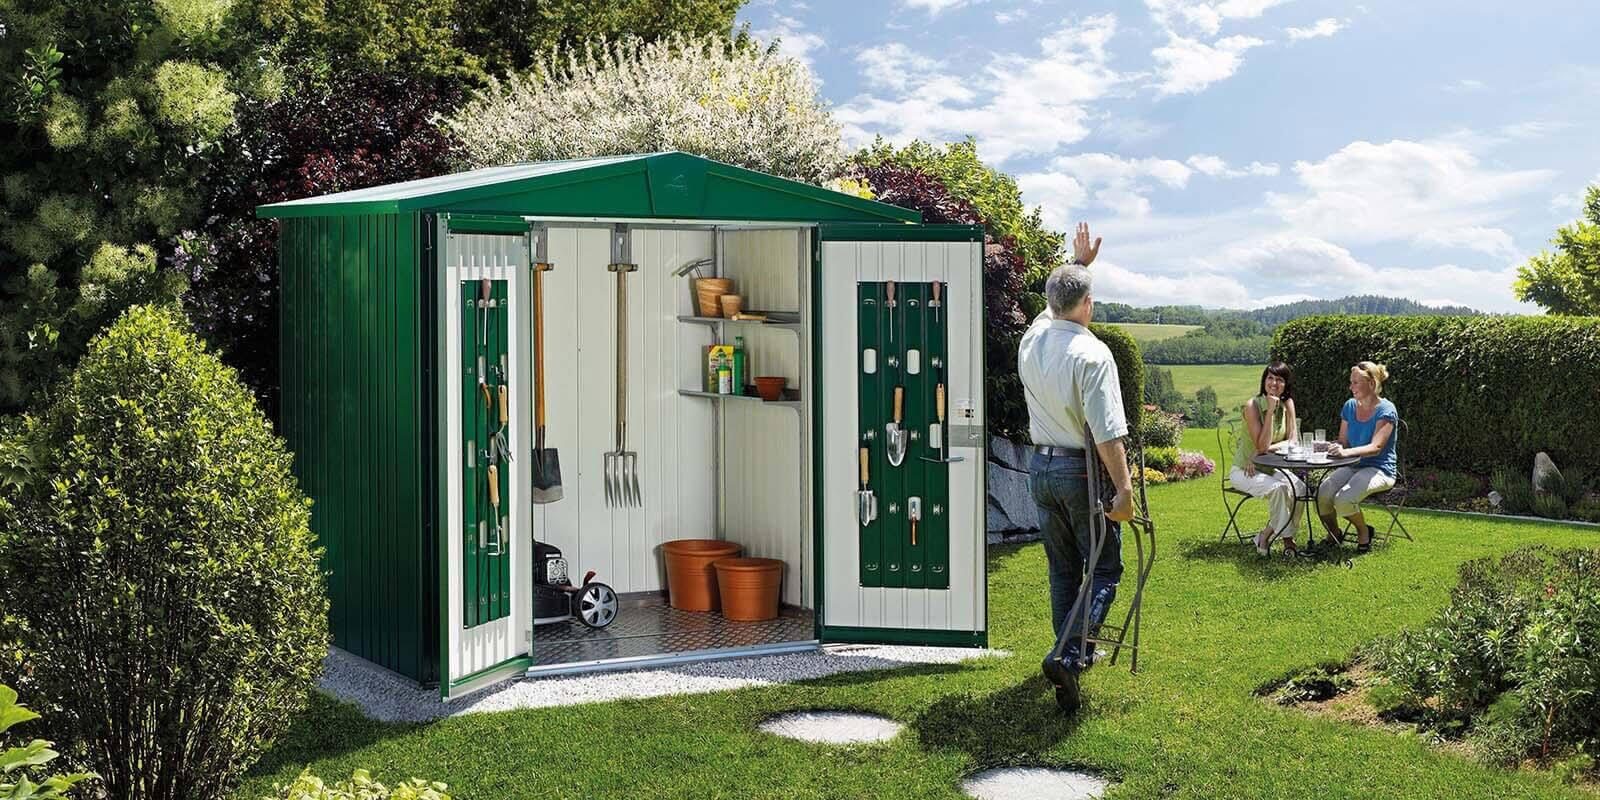 moderne ger teh user gartenh user und boxen aus metall biohort. Black Bedroom Furniture Sets. Home Design Ideas